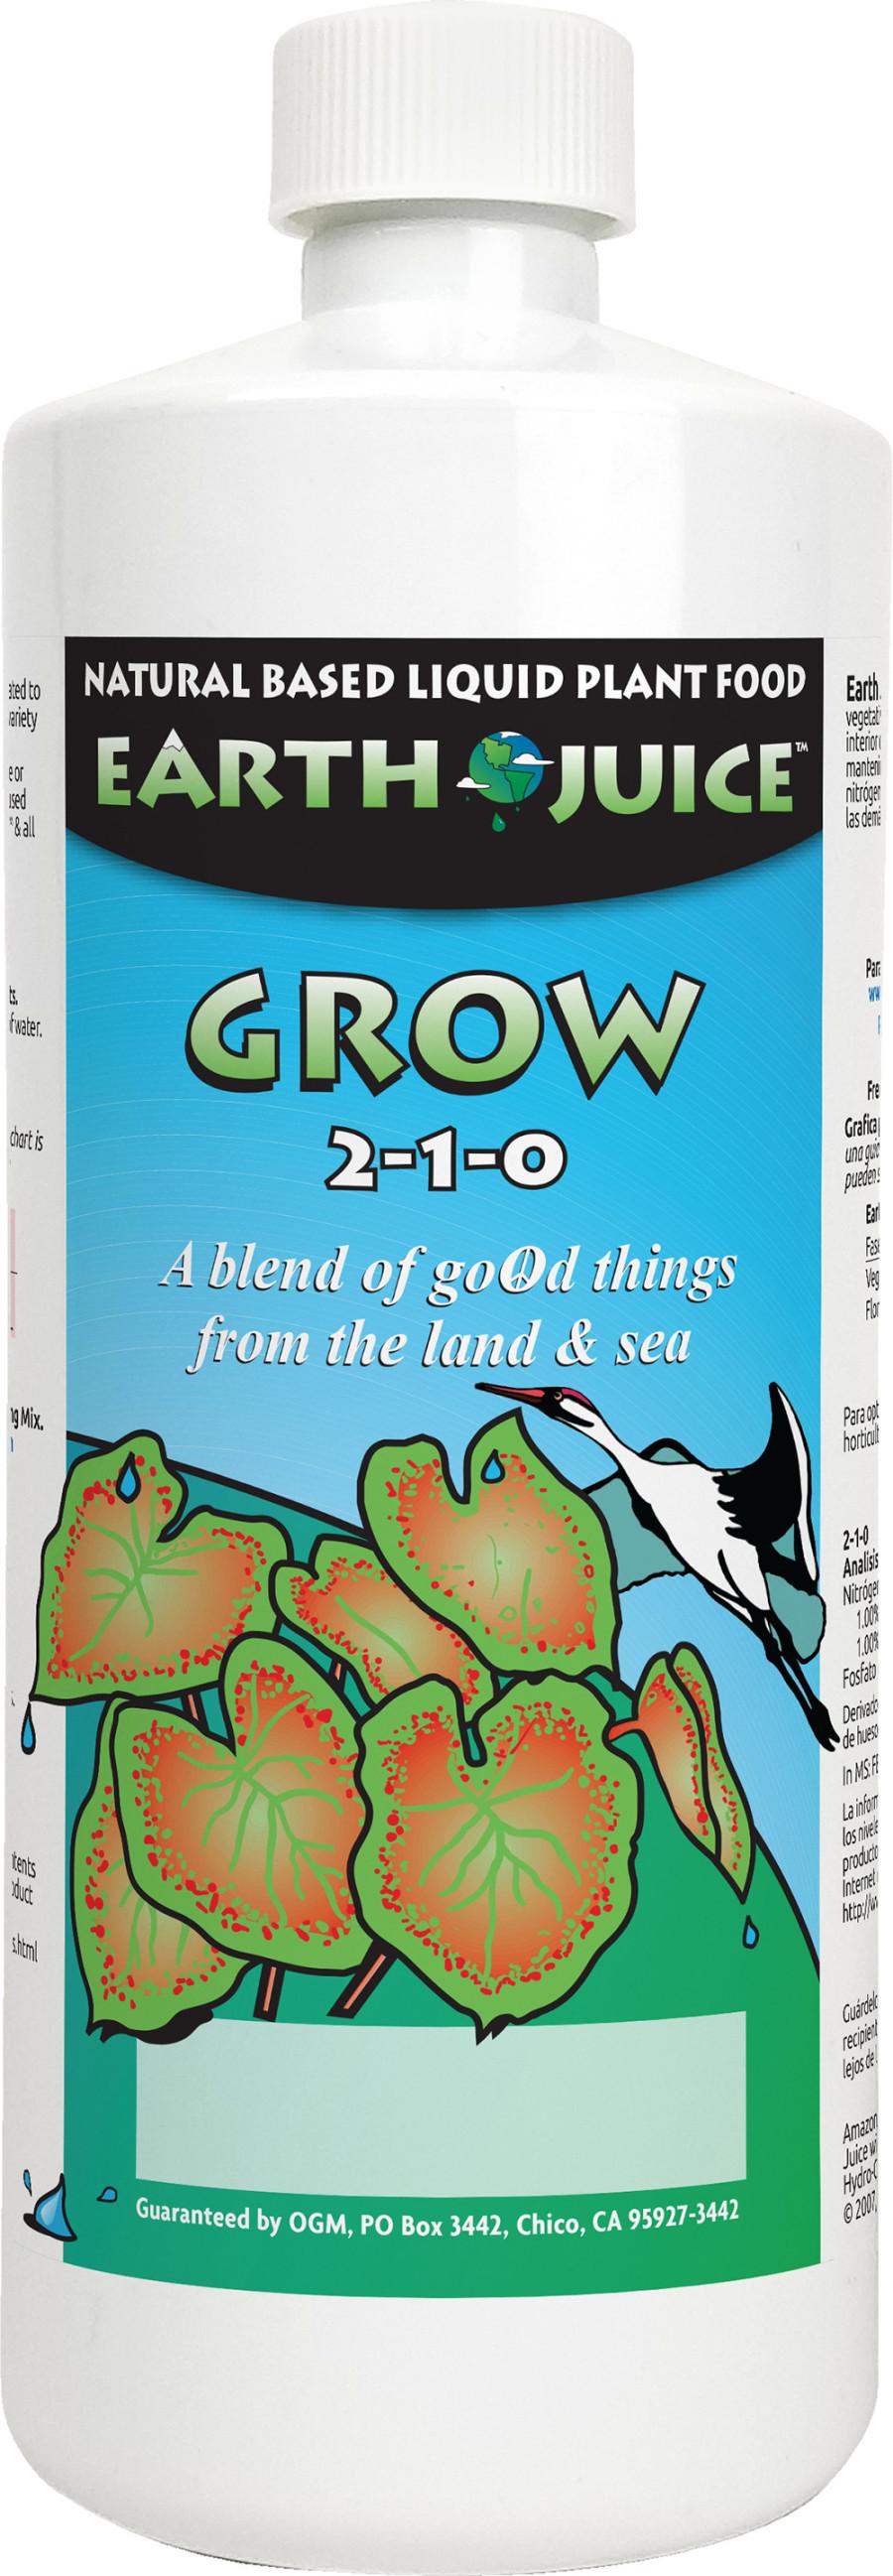 Earth Juice Grow 2-1-0 12ea/32 oz